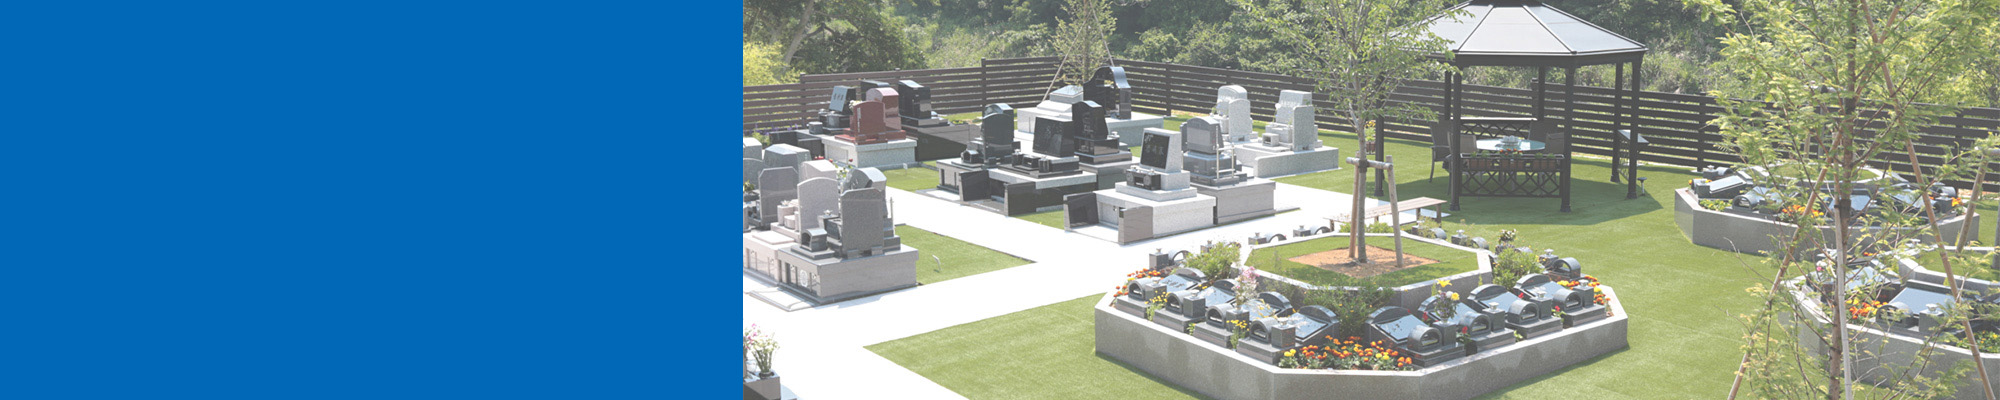 静岡県全域対応-お墓の施工実績-